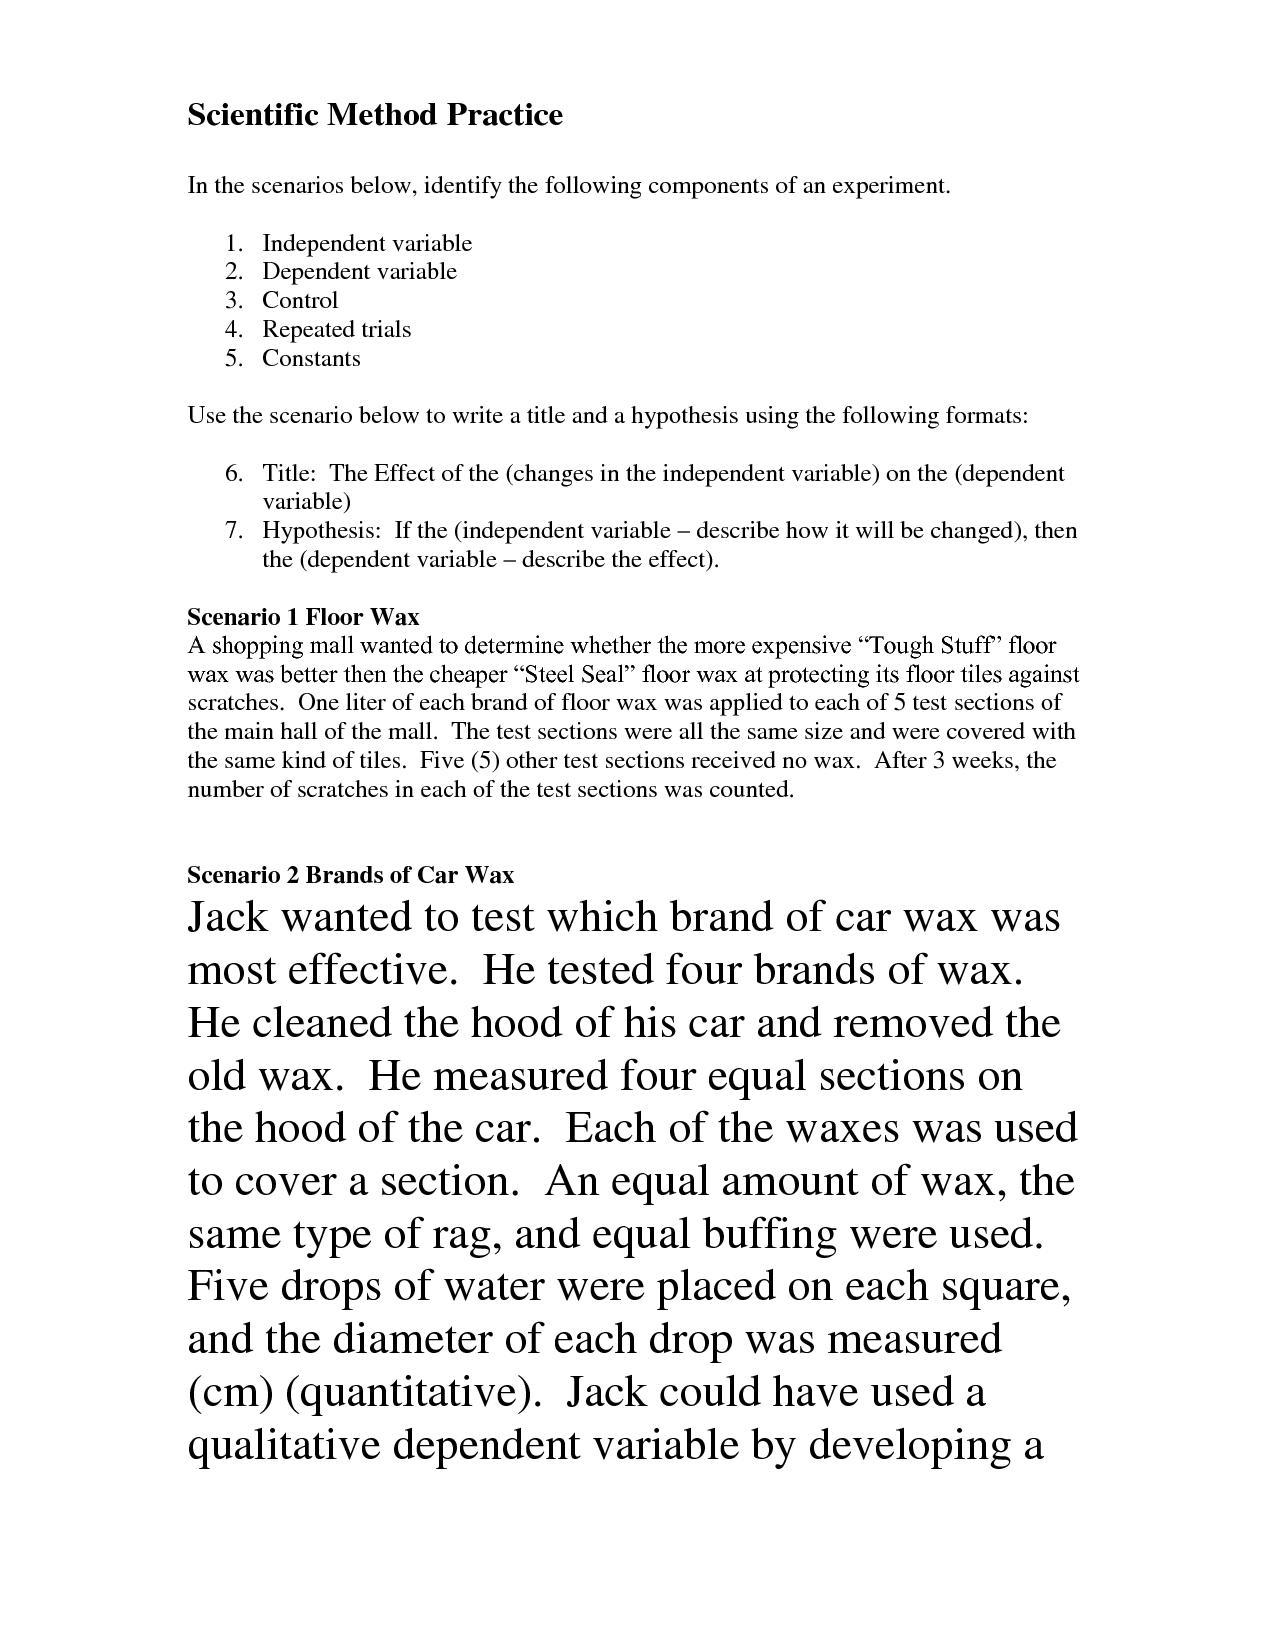 14 Best Images of Scientific Variables Worksheet - Scientific Method  Scenarios Worksheet [ 1650 x 1275 Pixel ]